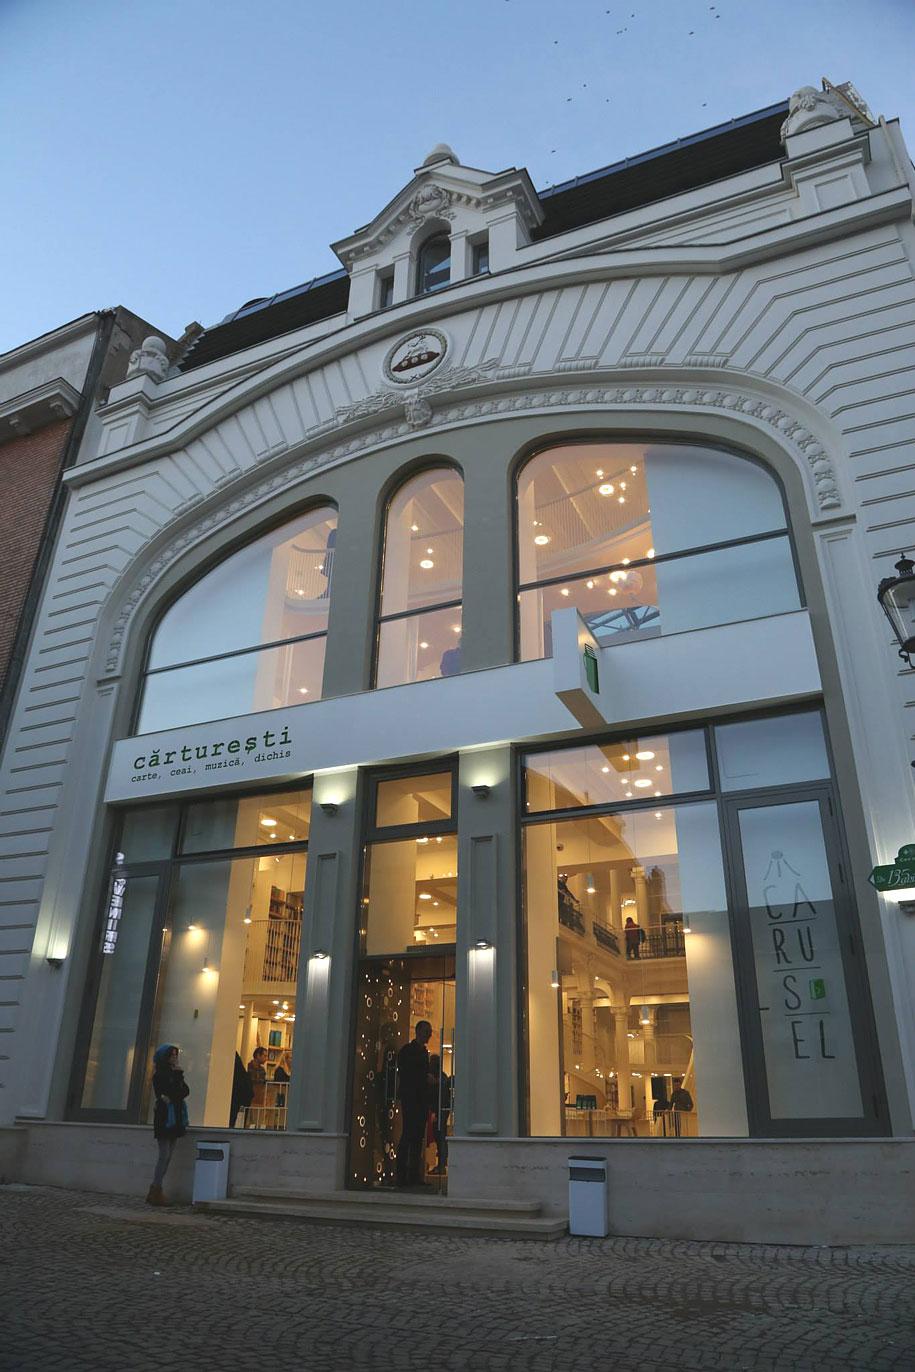 fantastic-bookstore-carousel-light-bucharest-romania-15-1